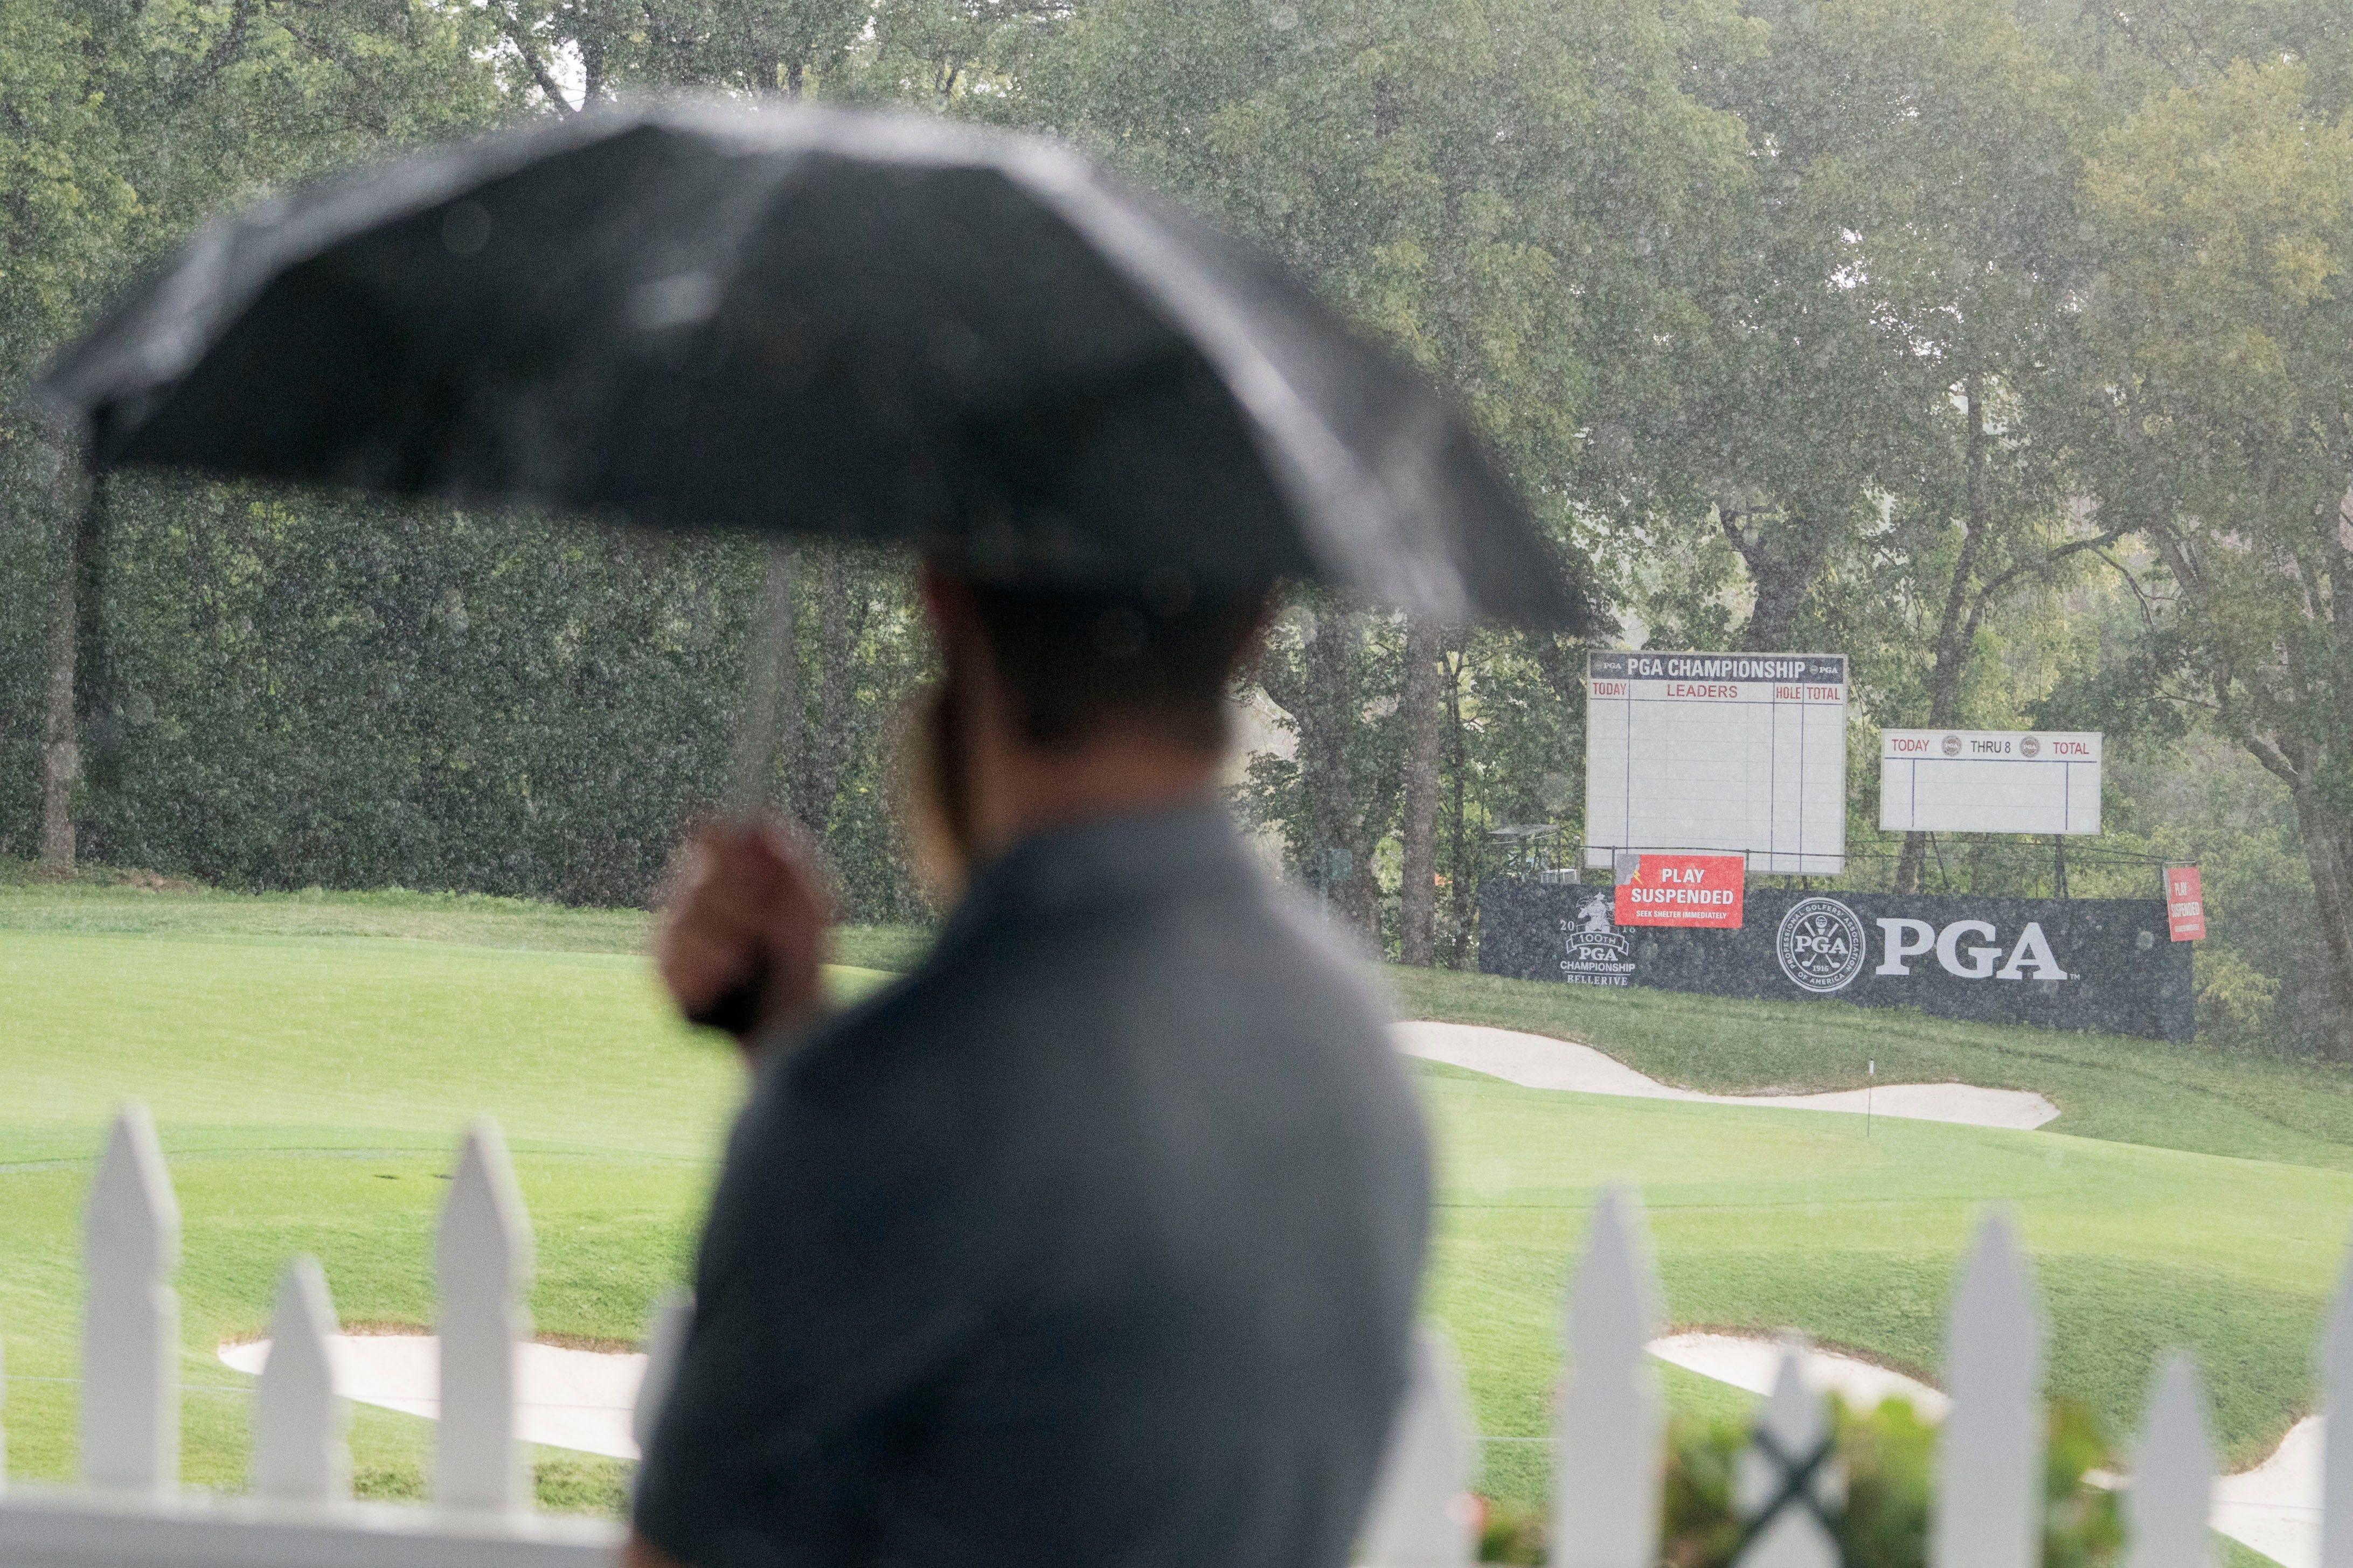 f9a9c6c8916 PGA Championship  Rickie Fowler pays tribute to golfer Jarrod Lyle